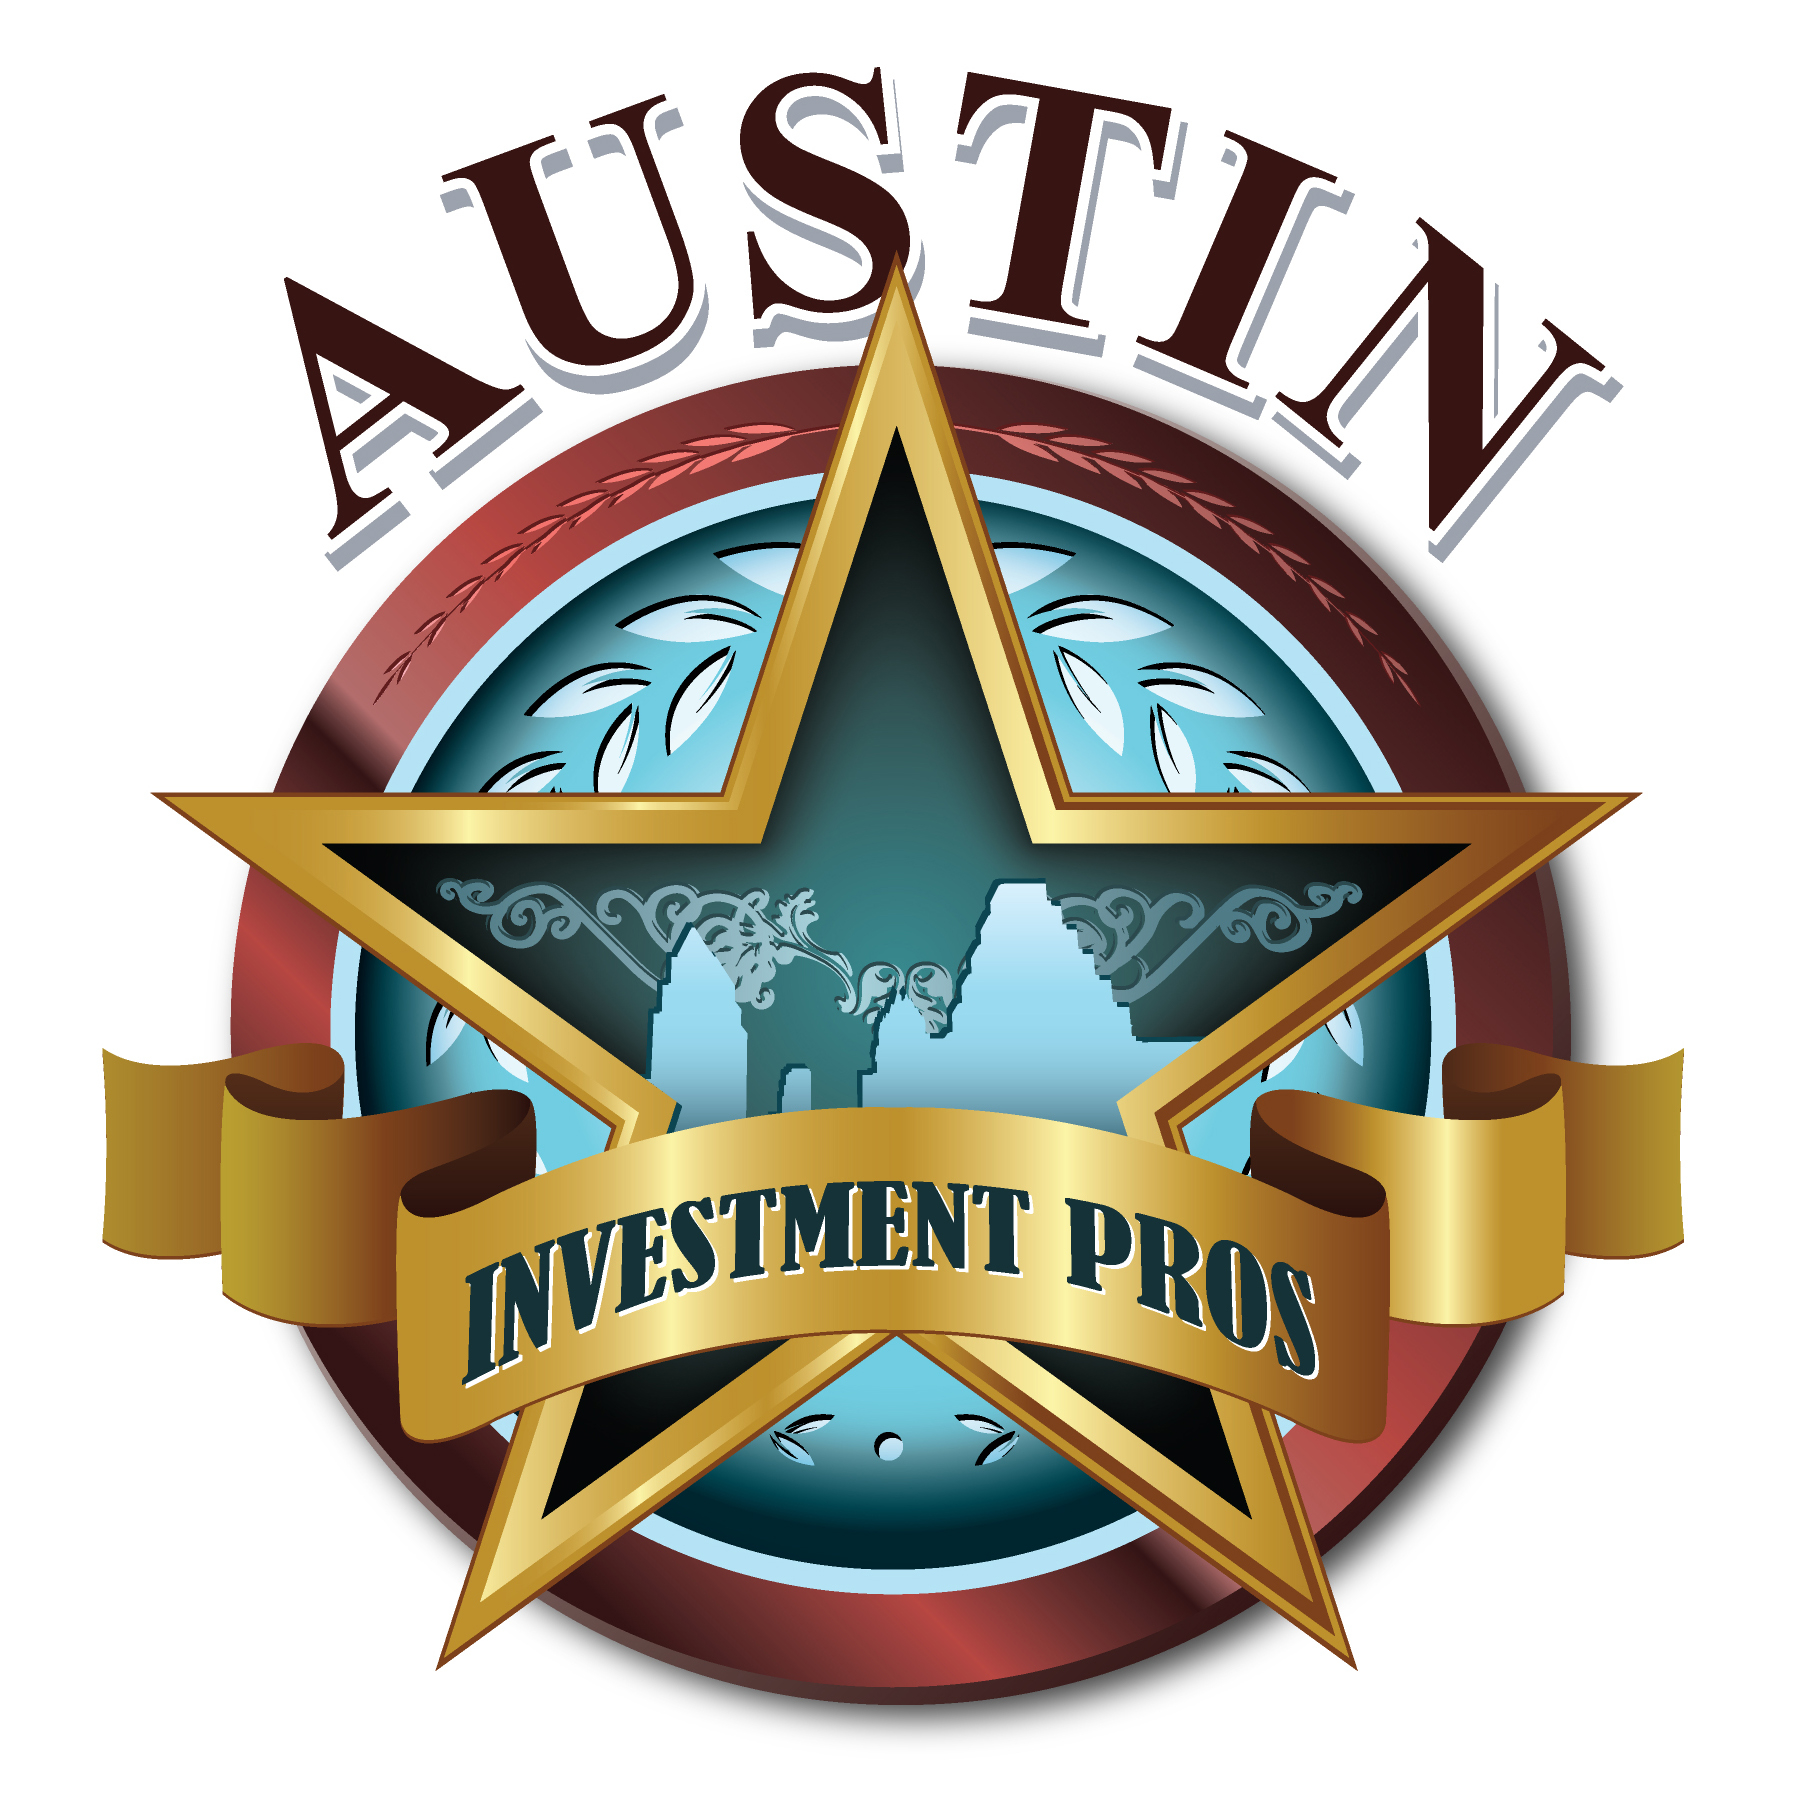 Austin's Investment Pros LLC image 1